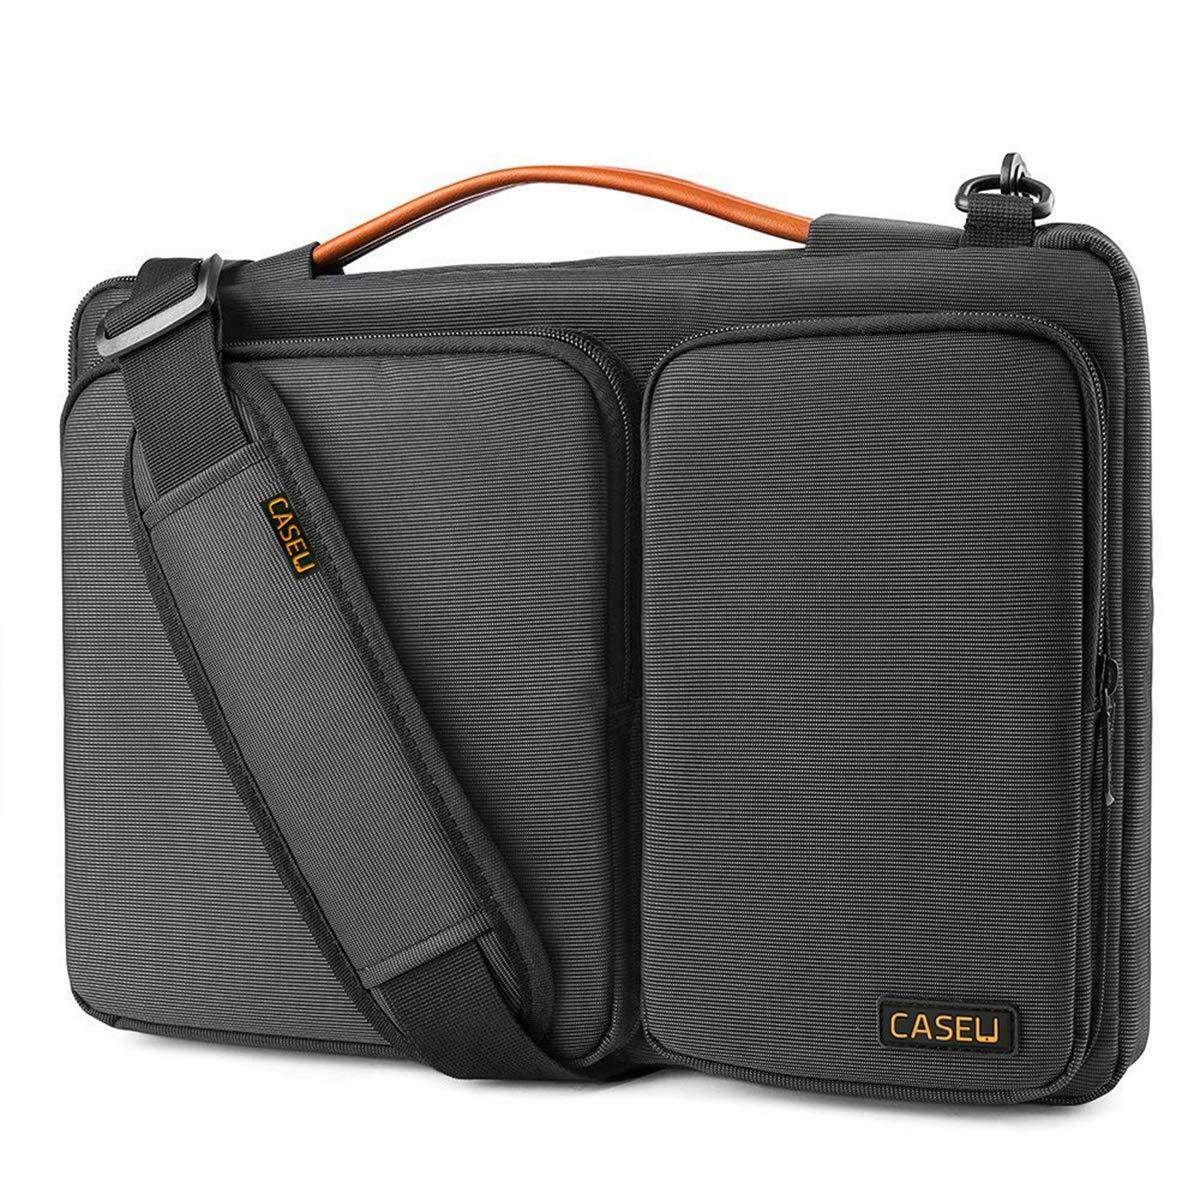 CASE U Polyester 13.3-inch 360 Degree Protective Laptop Bag (Black)